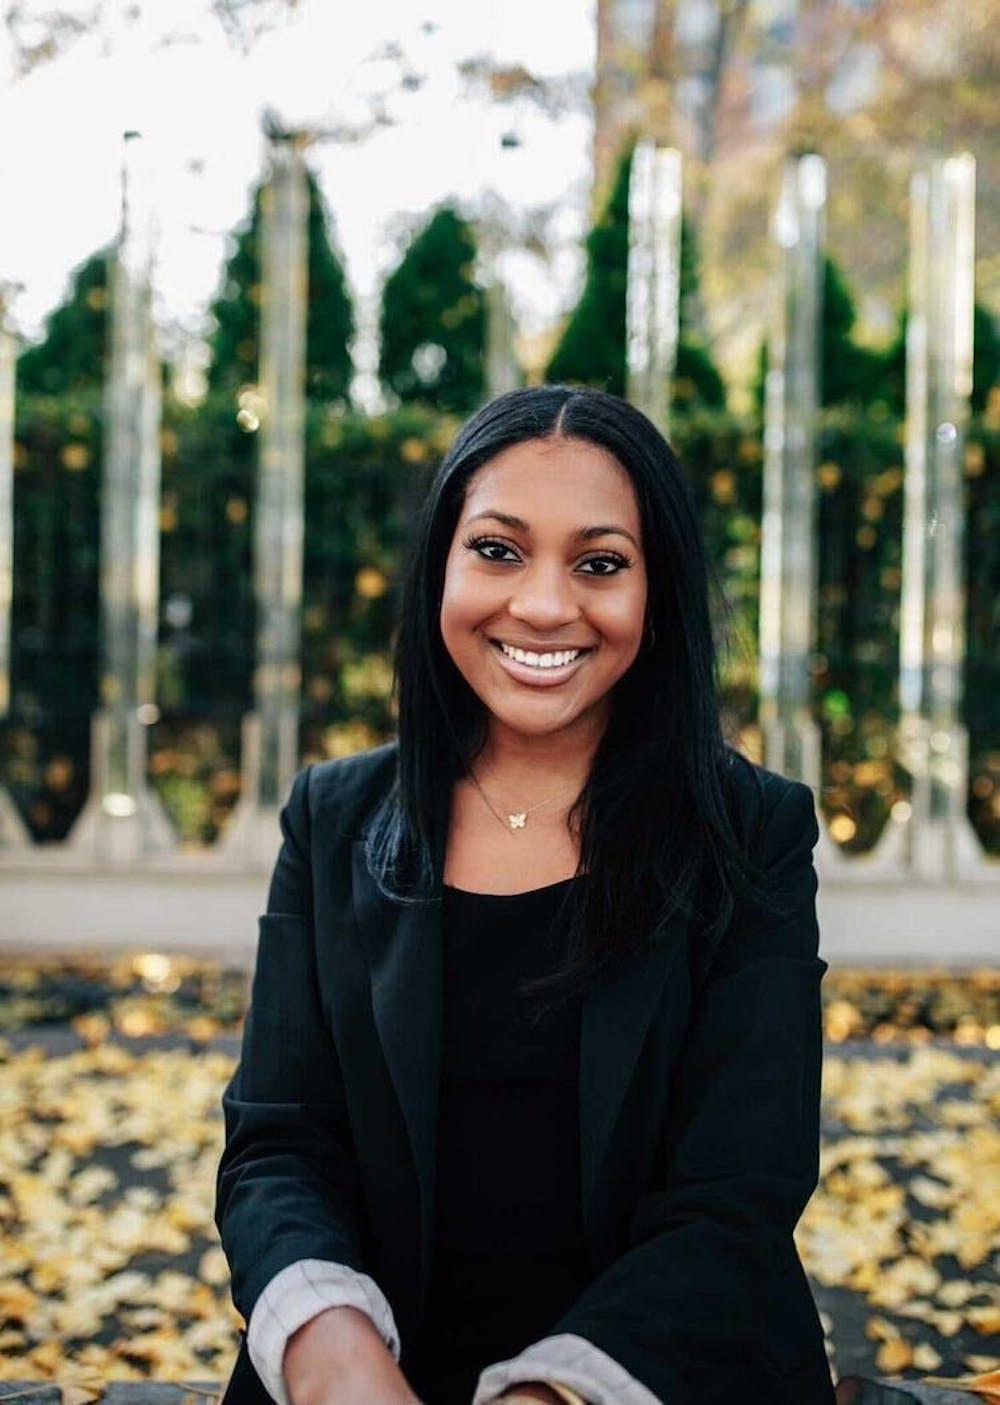 SG newcomer Zoë Washington elected Speaker of the Undergraduate Senate